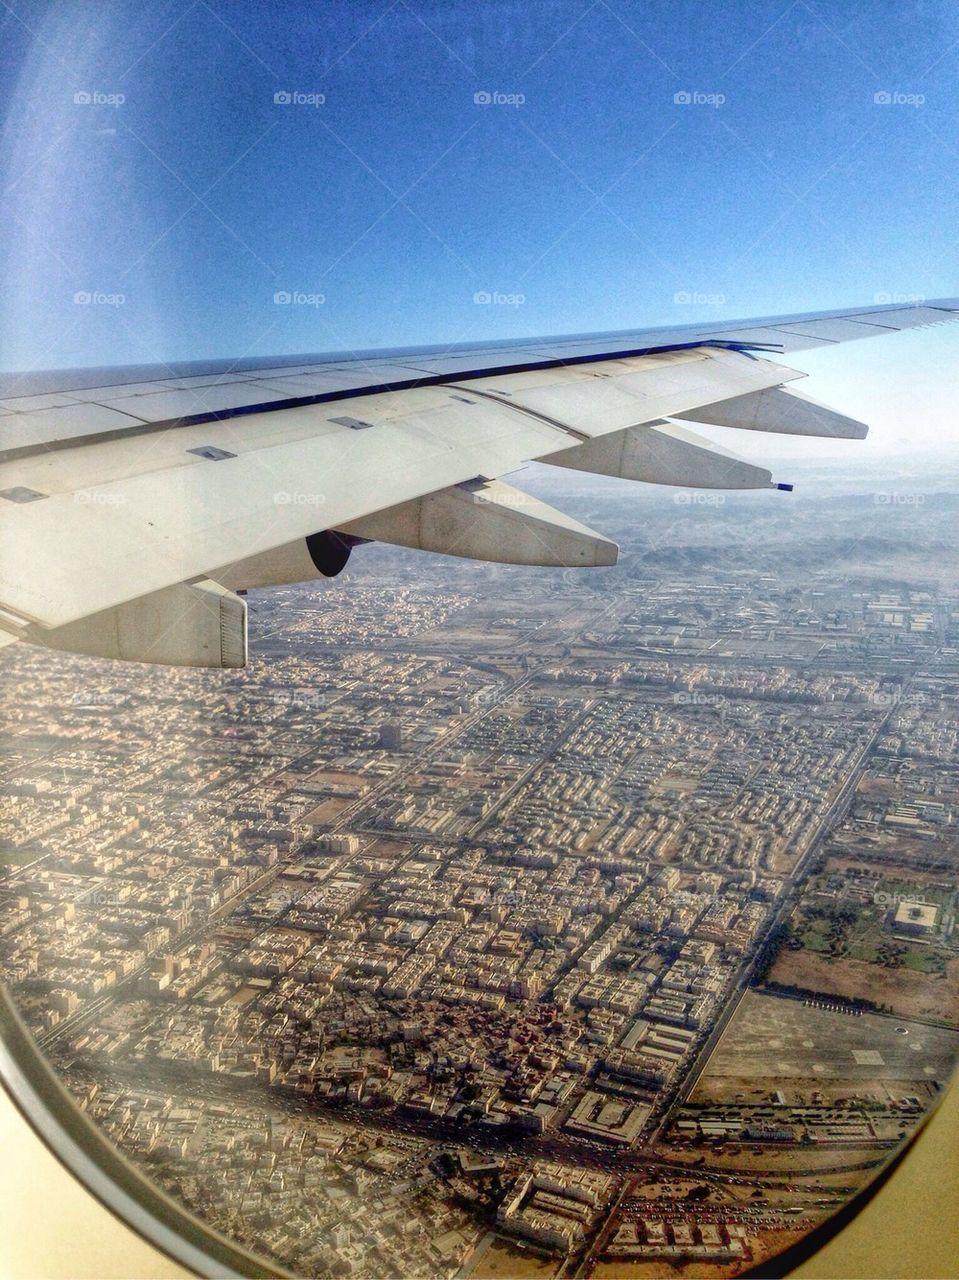 Landing at Jeddah airport